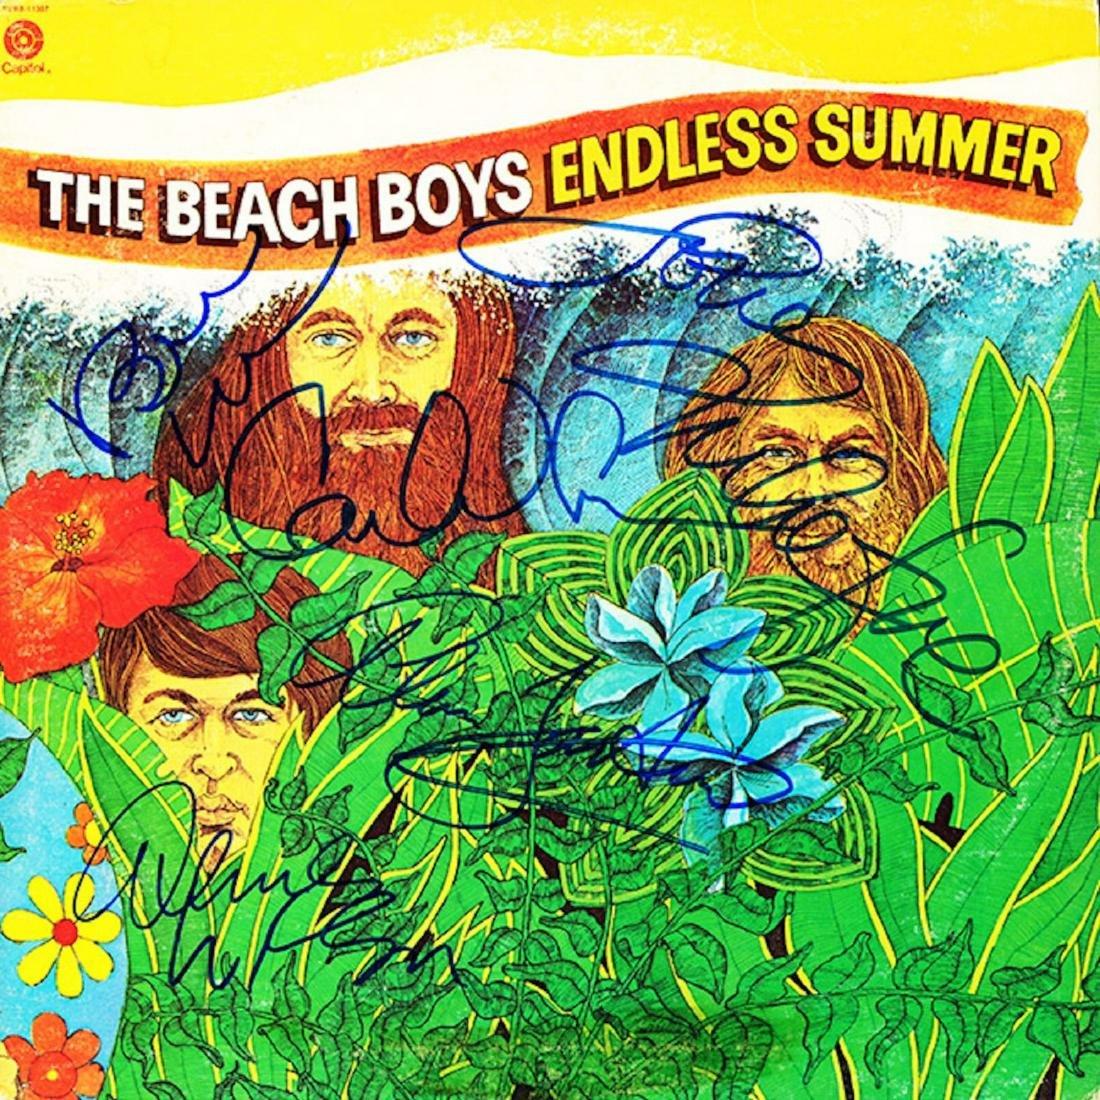 Signed Beach Boys Endless Summer Album